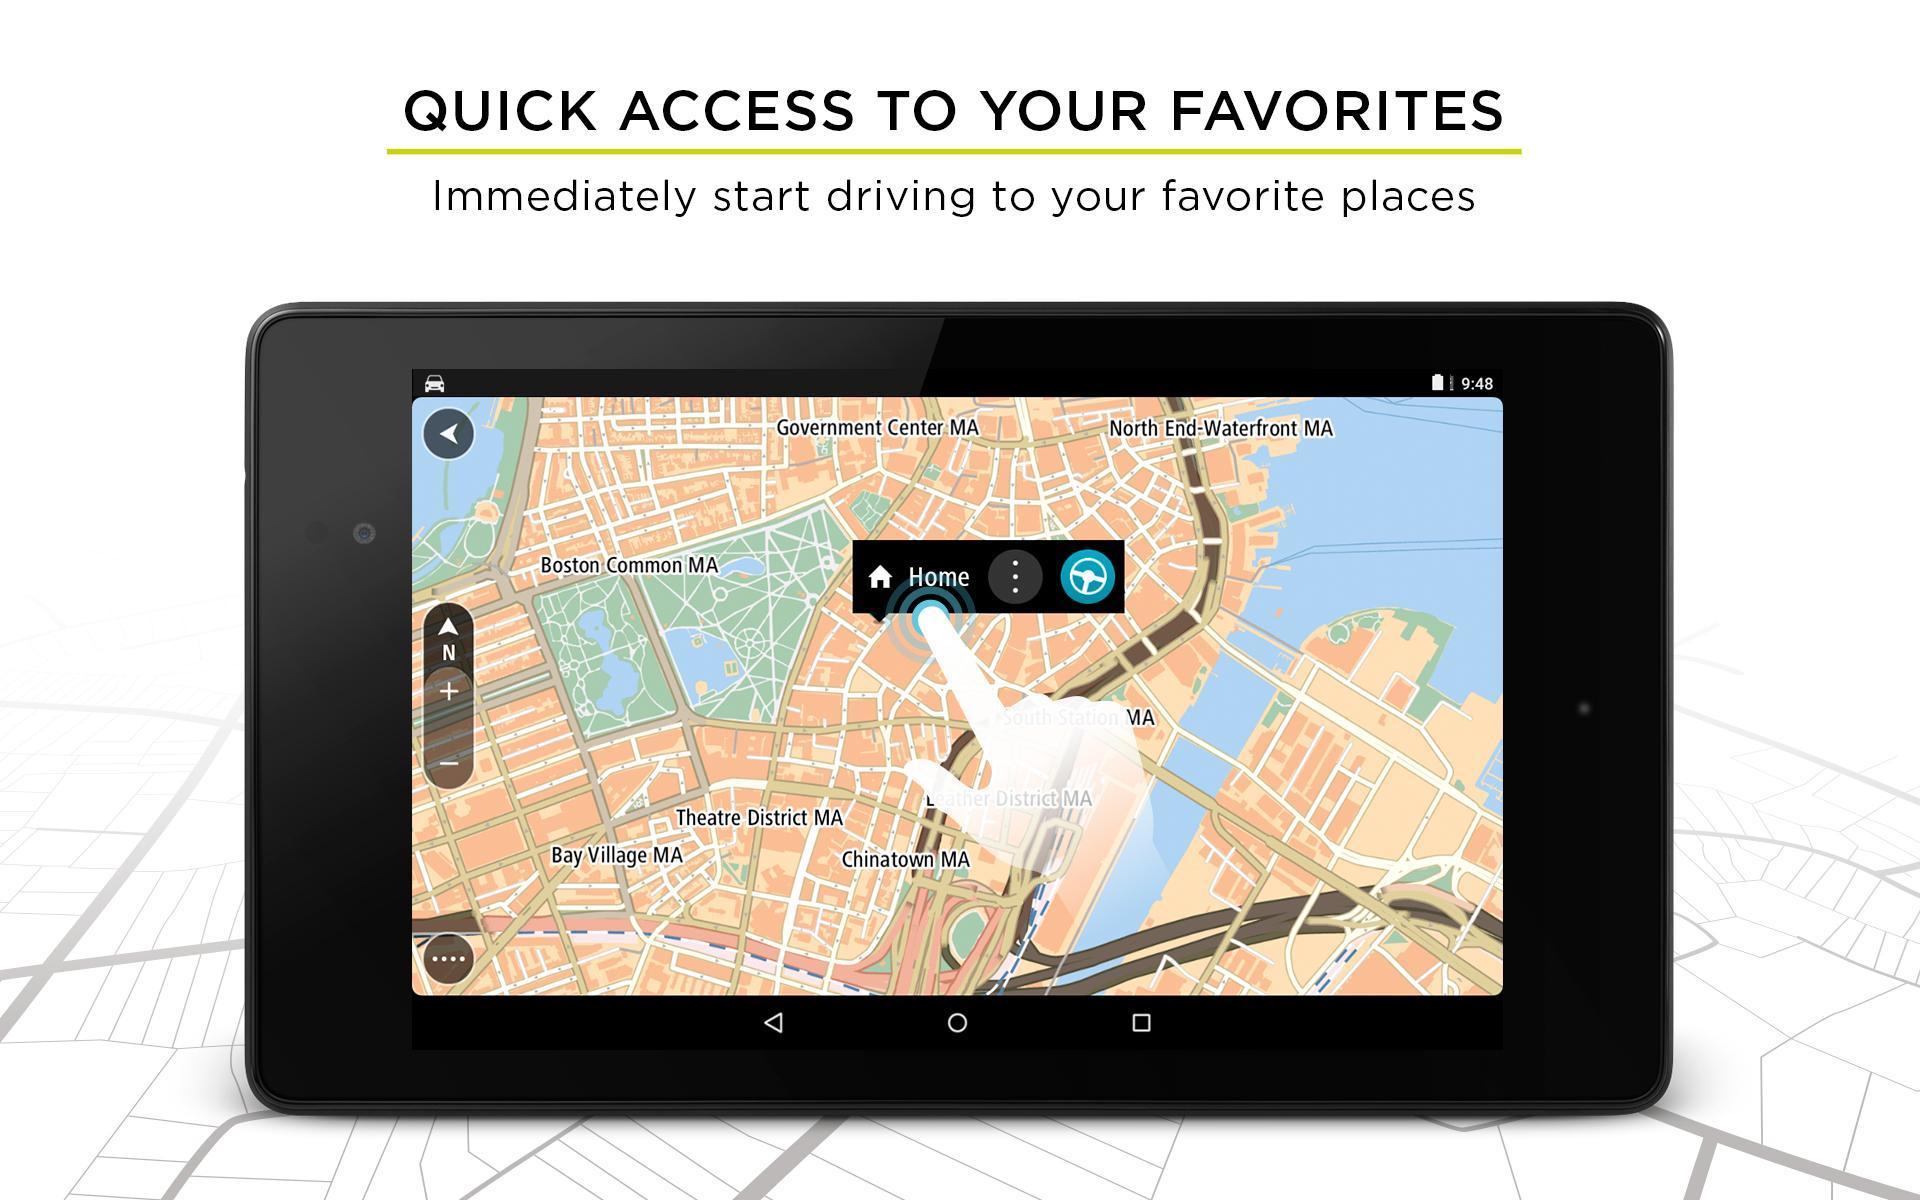 TomTom GPS Navigation - Live Traffic Alerts & Maps 2.0.4 Screenshot 17